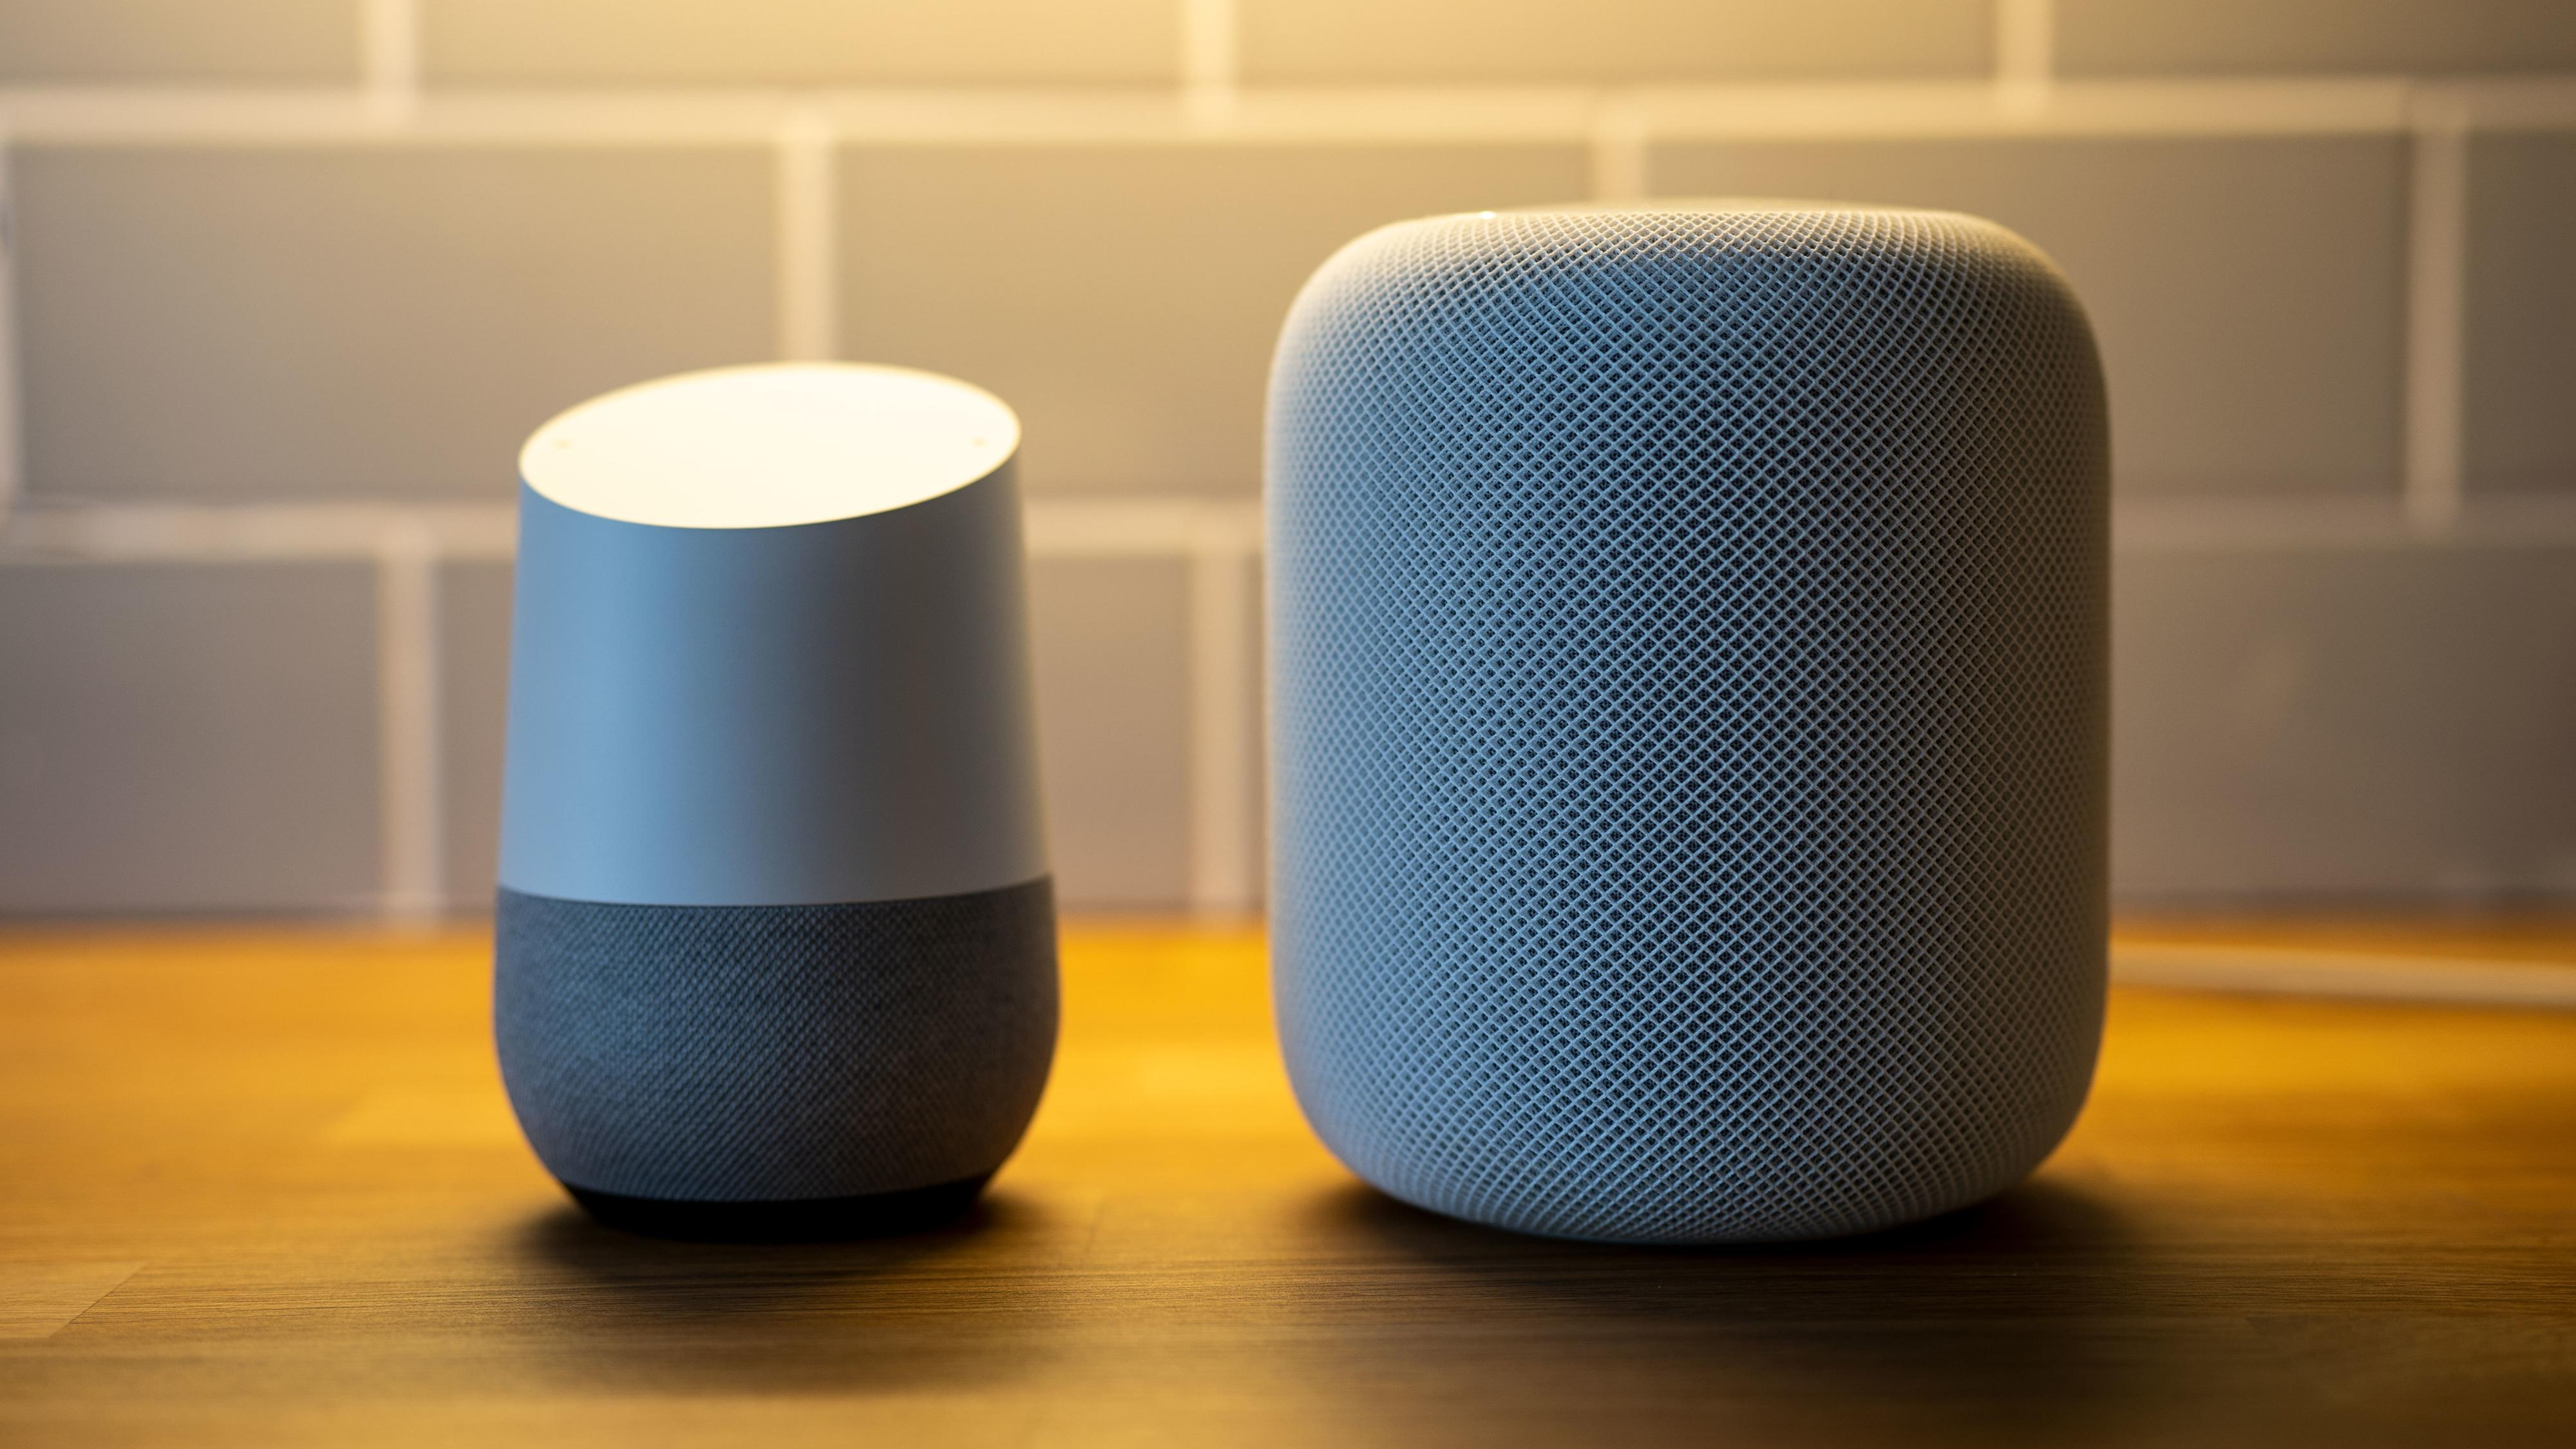 Lyden til Apples HomePod er milevis foran Google Home. Den koster dog betydelig mer, og er ikke offisielt sluppet i Norge.